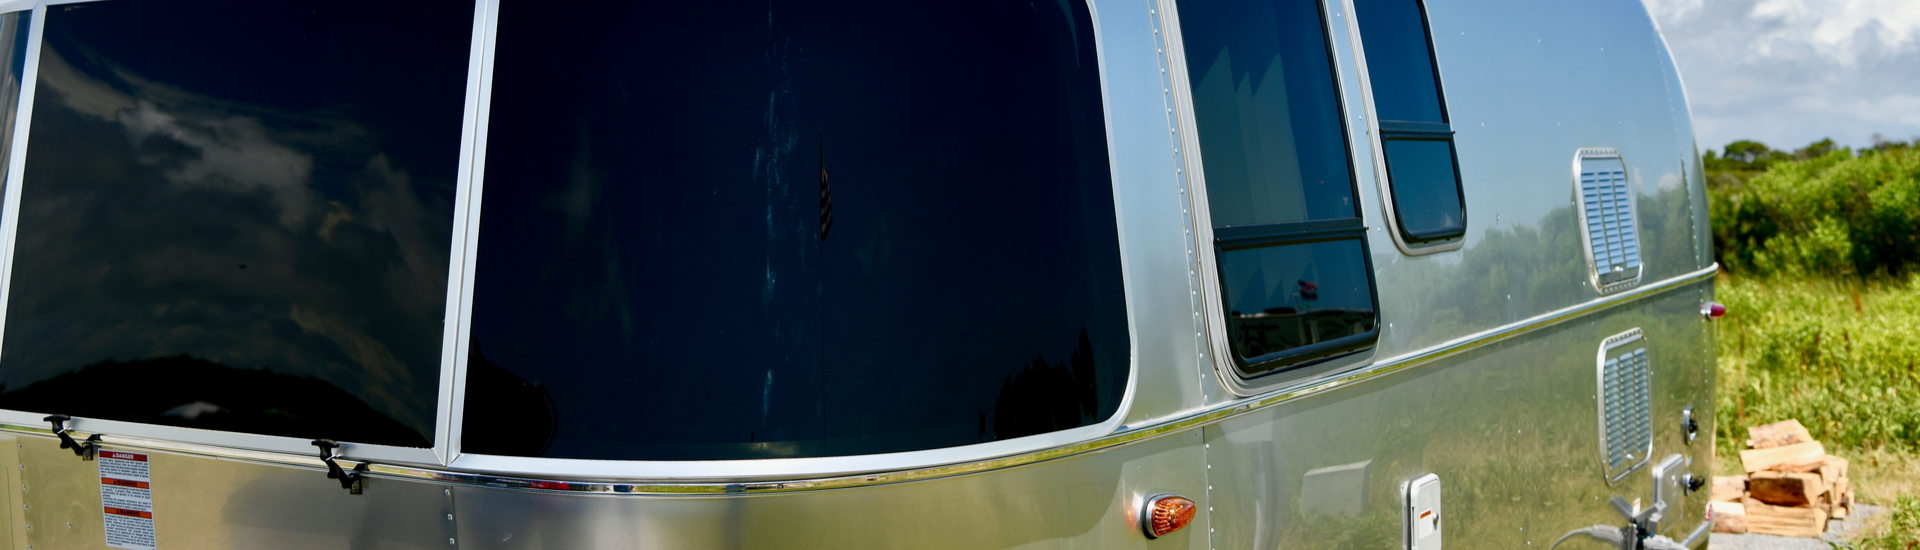 Airstream Rock Guards